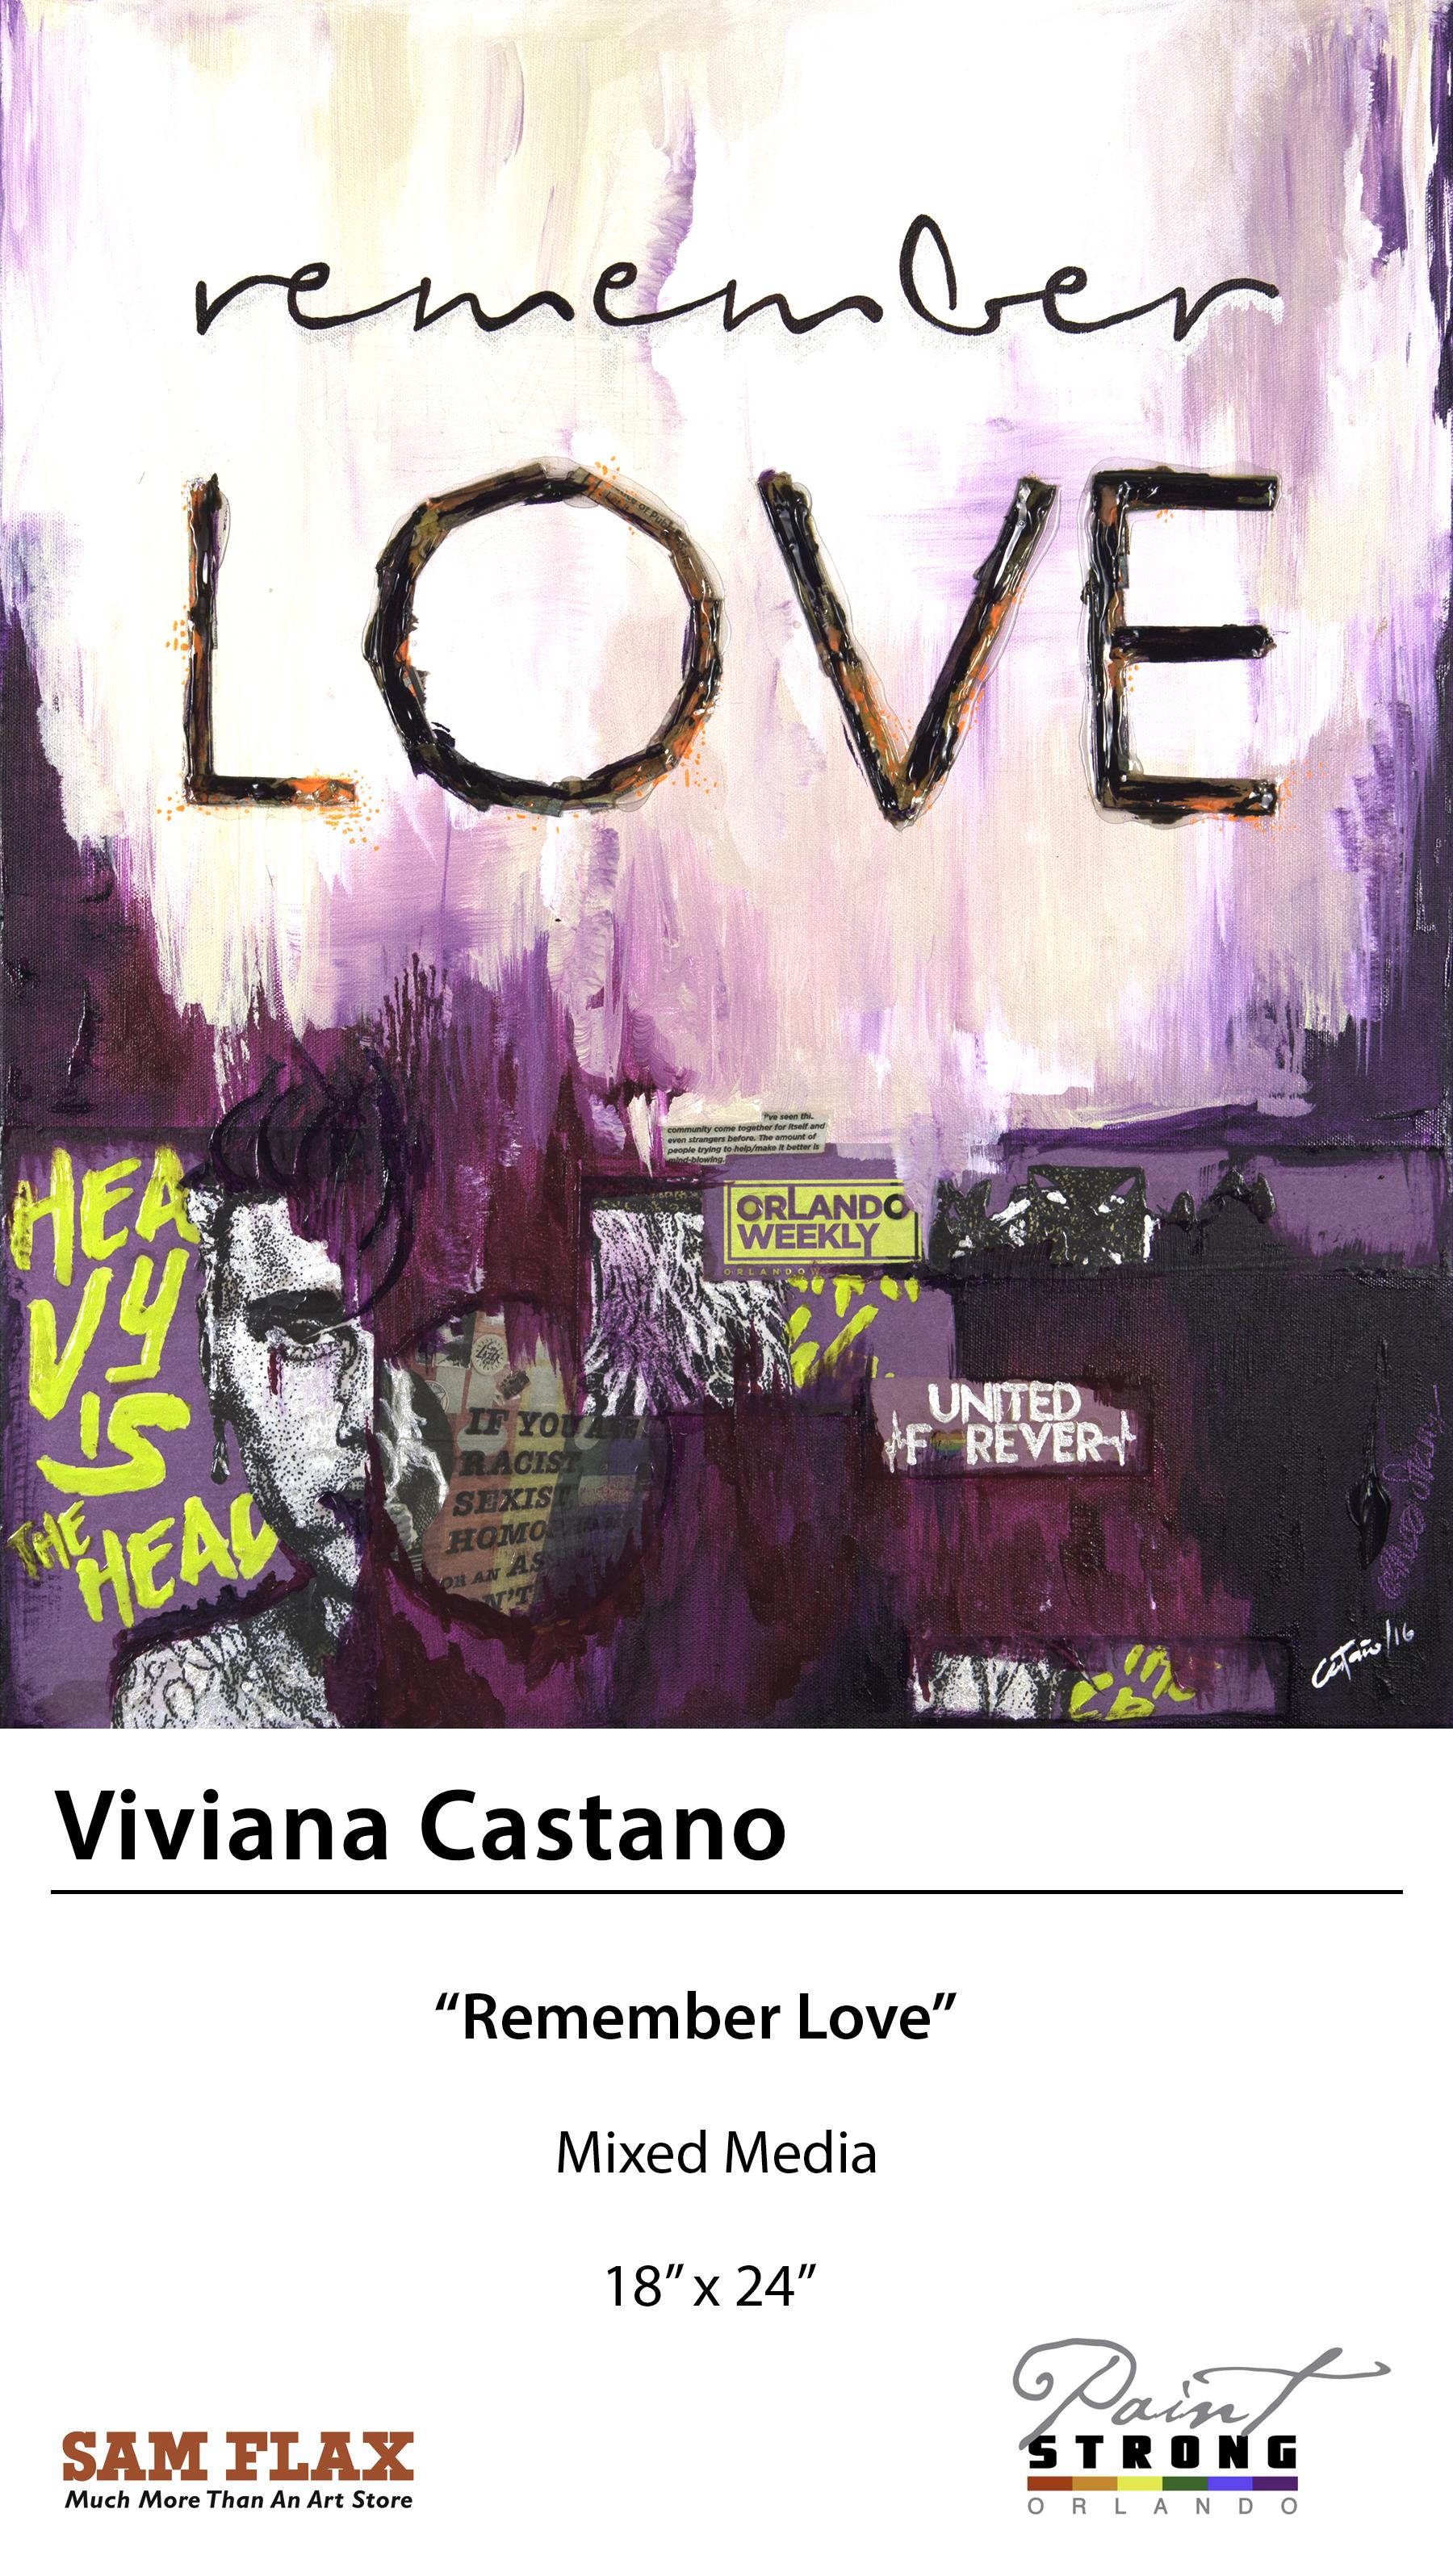 Viviana Castano